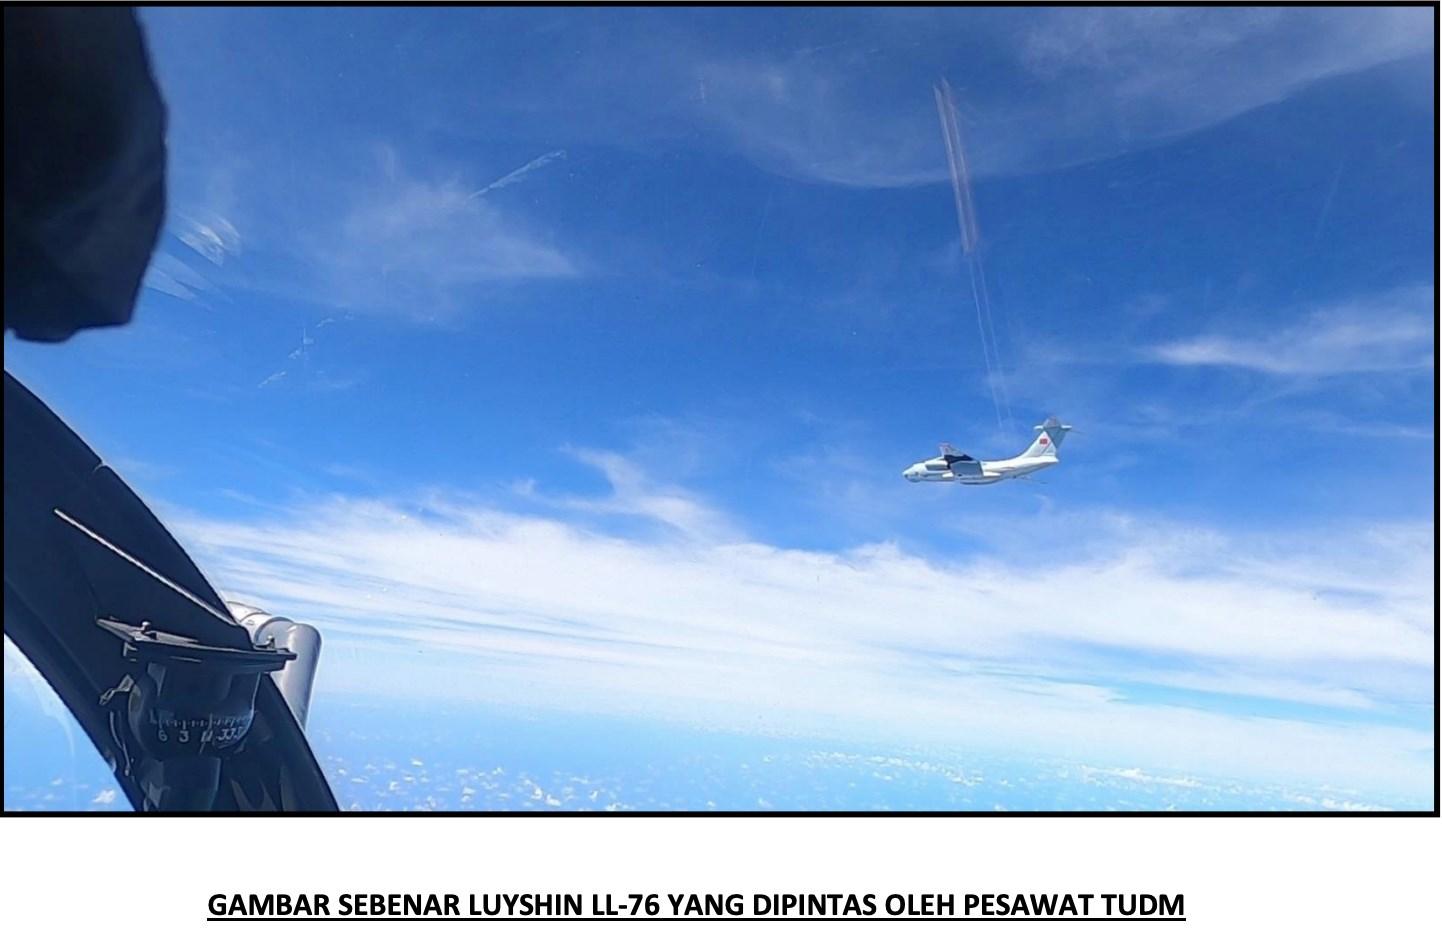 16 Pesawat Mencurigakan Milik Tentera Udara China Dikesan Masuk Ke Ruang Udara Malaysia 2